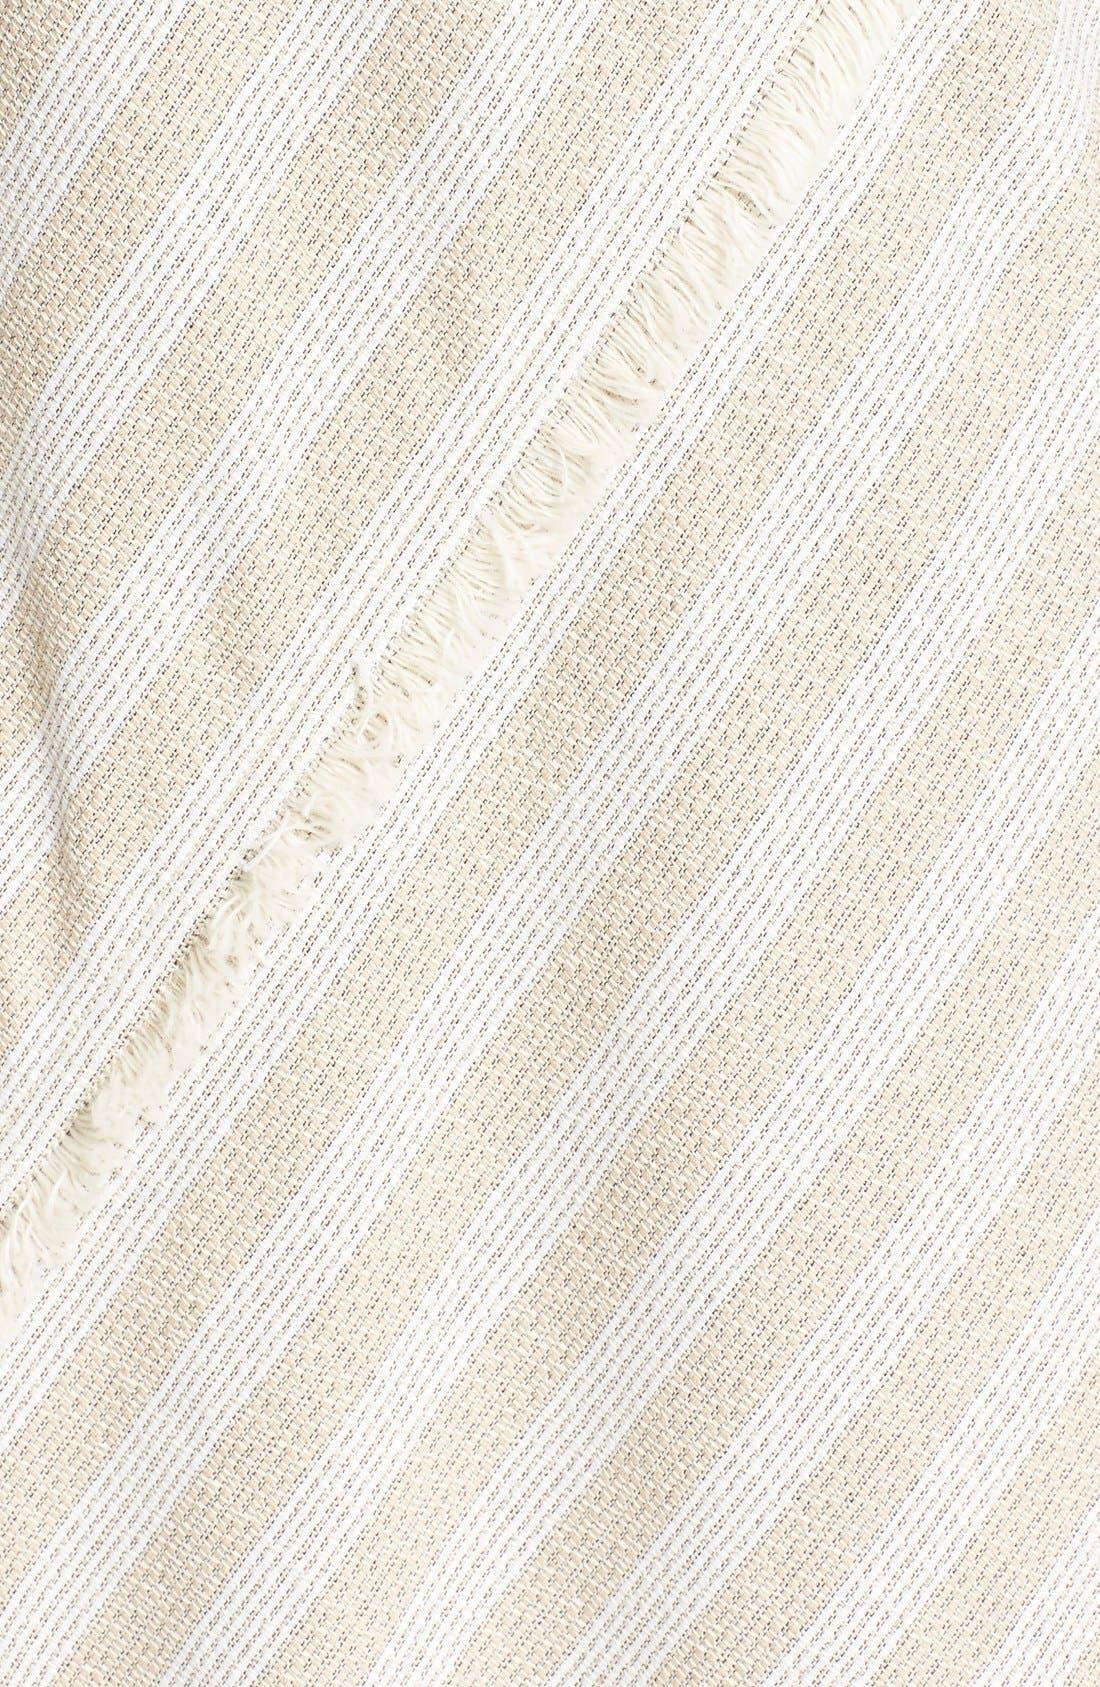 'Cosby' Stripe Sleeveless Dress,                             Alternate thumbnail 3, color,                             Natural Stripe